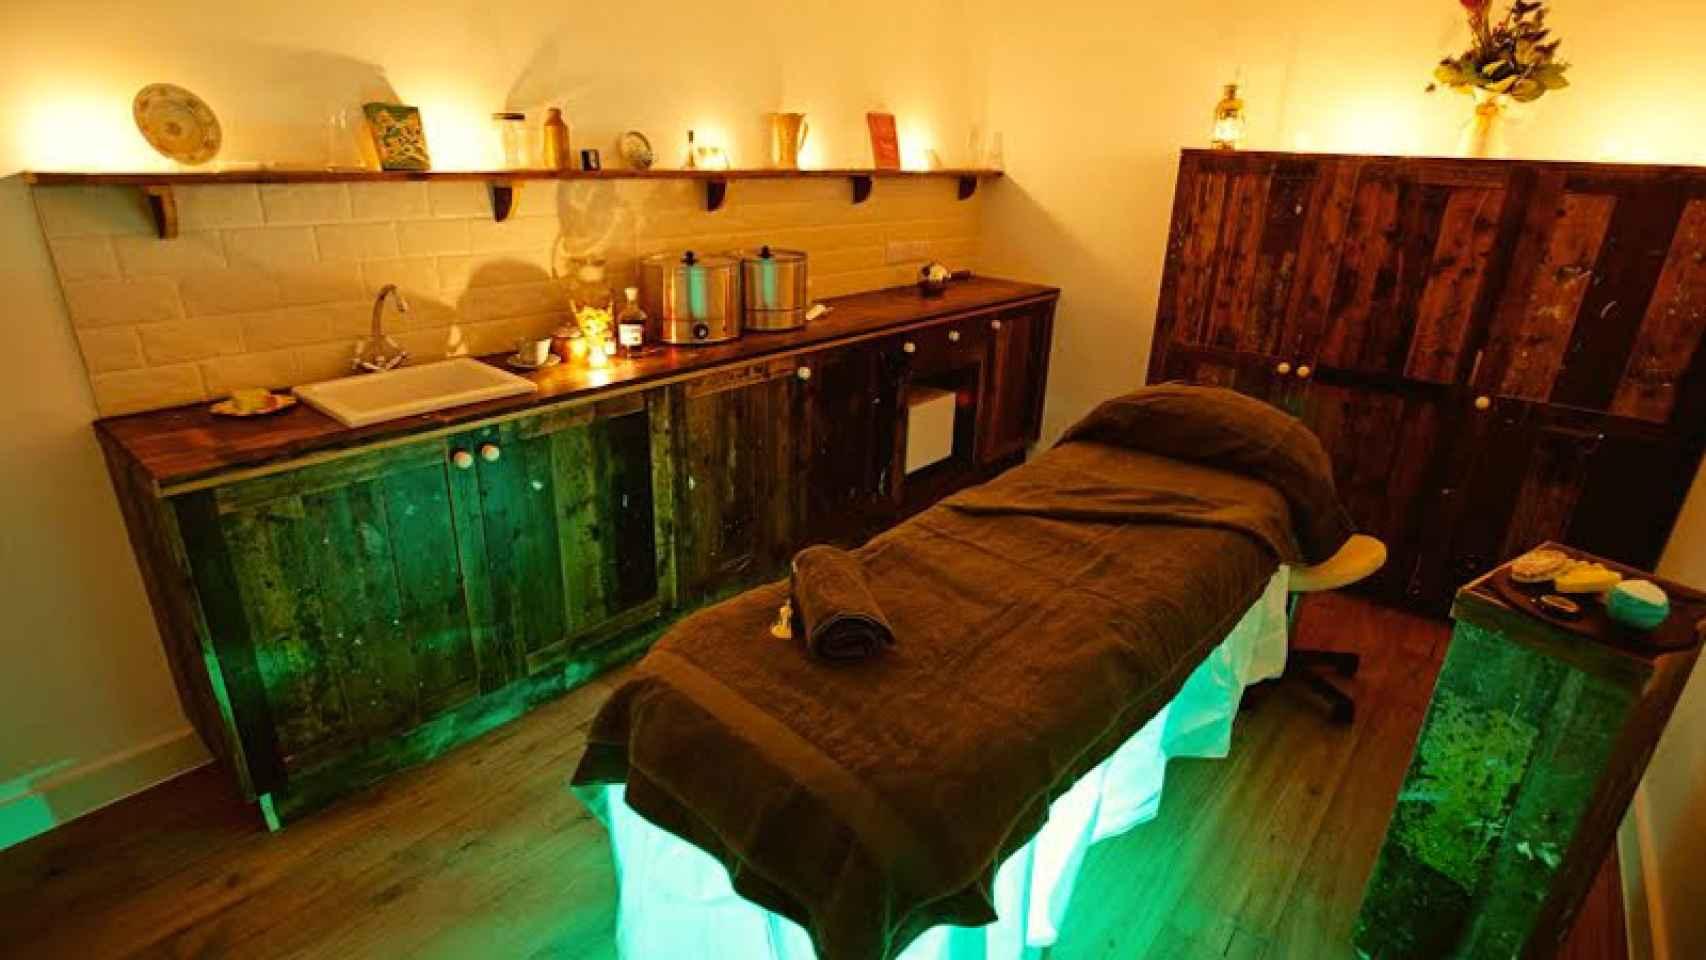 Zona de masajes con decoración de inspiración inglesa.